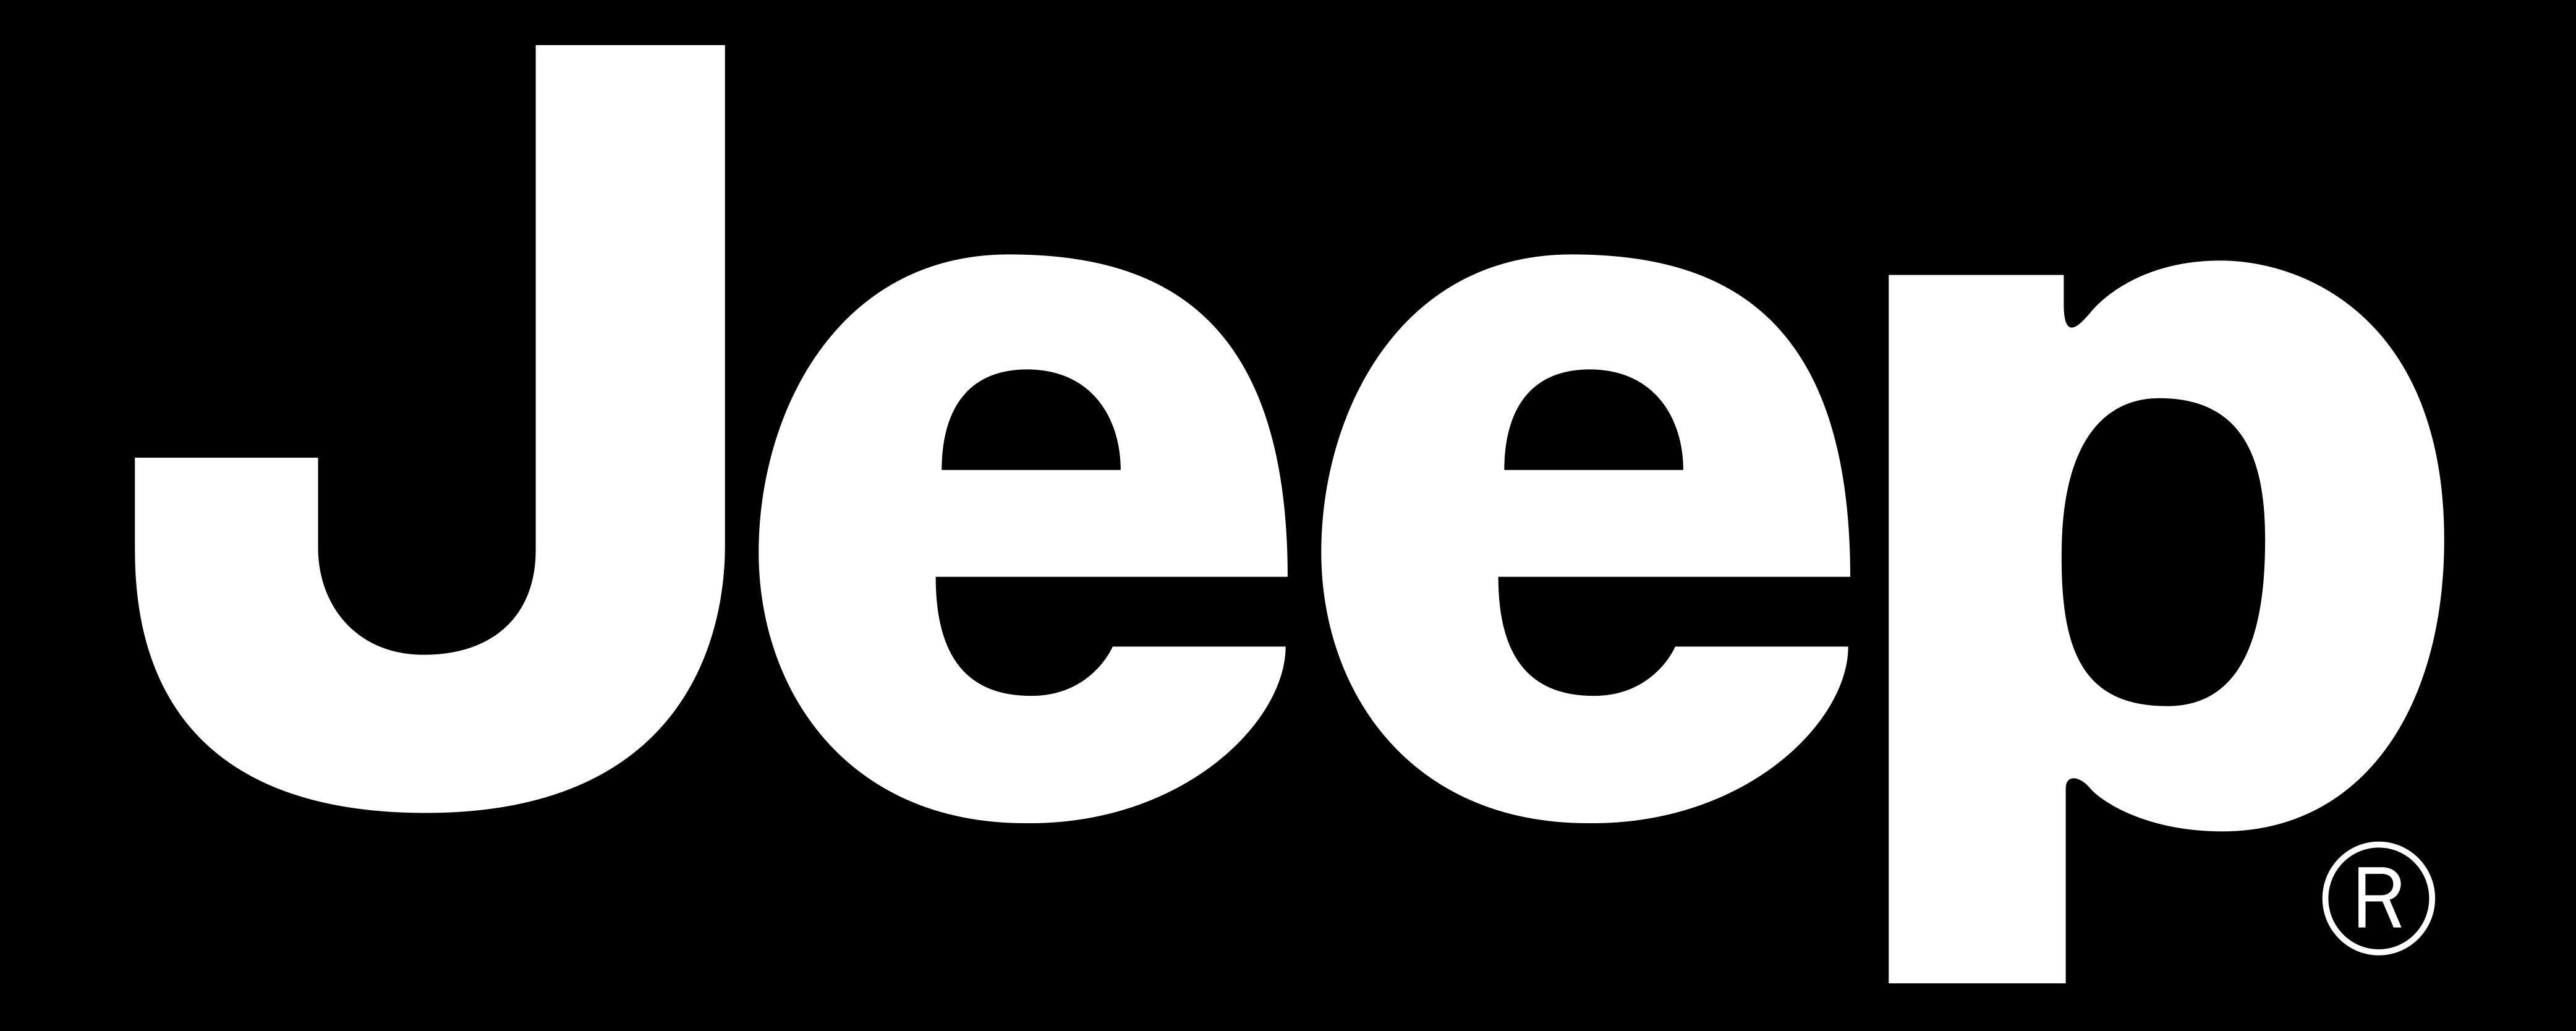 Jeep_logo_white